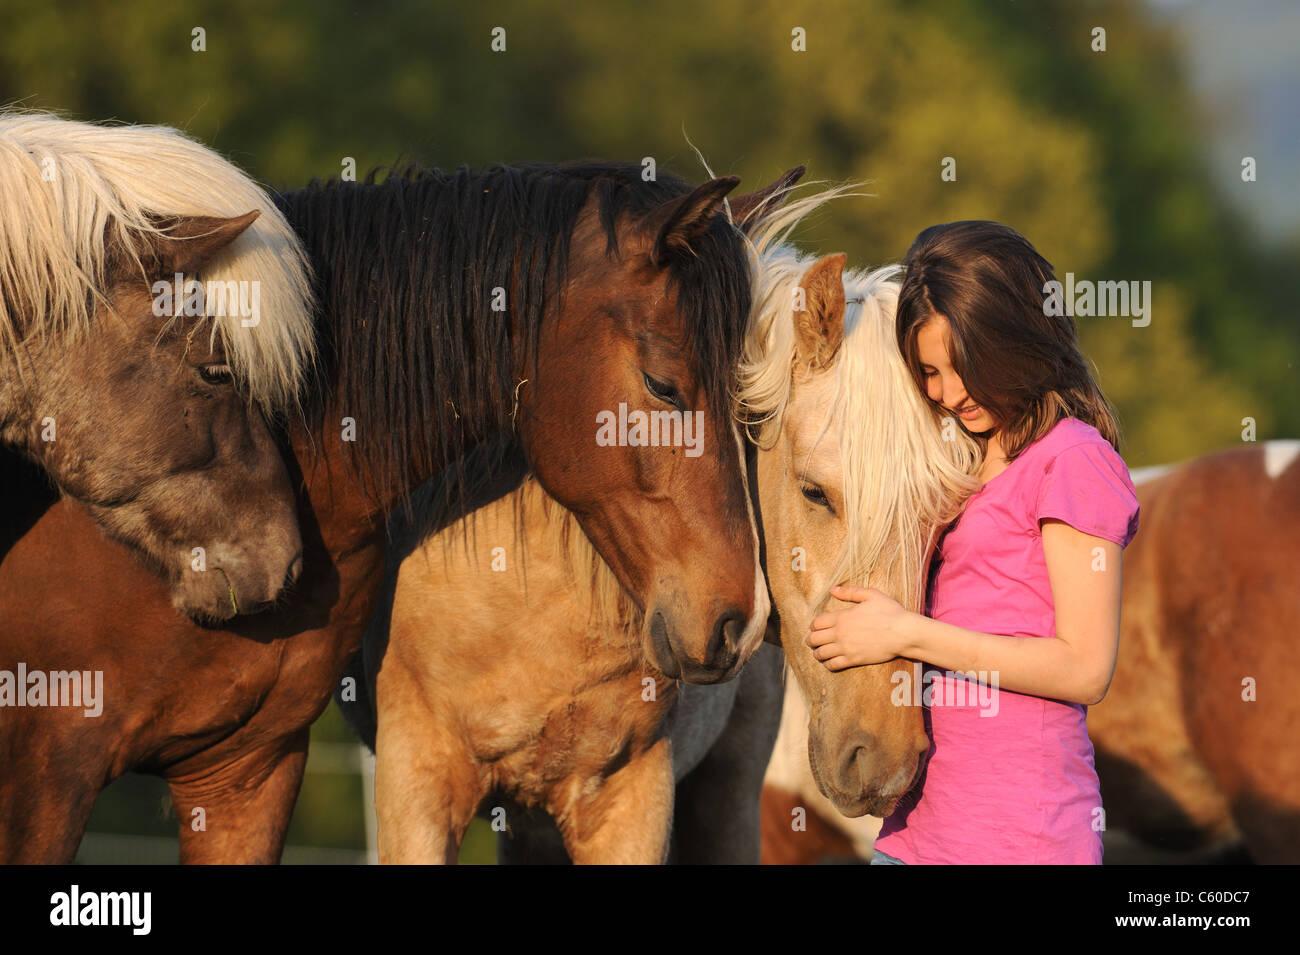 Mangalarga Marchador (Equus ferus caballus). Girl with Mangalarga Machadors and Icelandic Horses on a meadow. - Stock Image